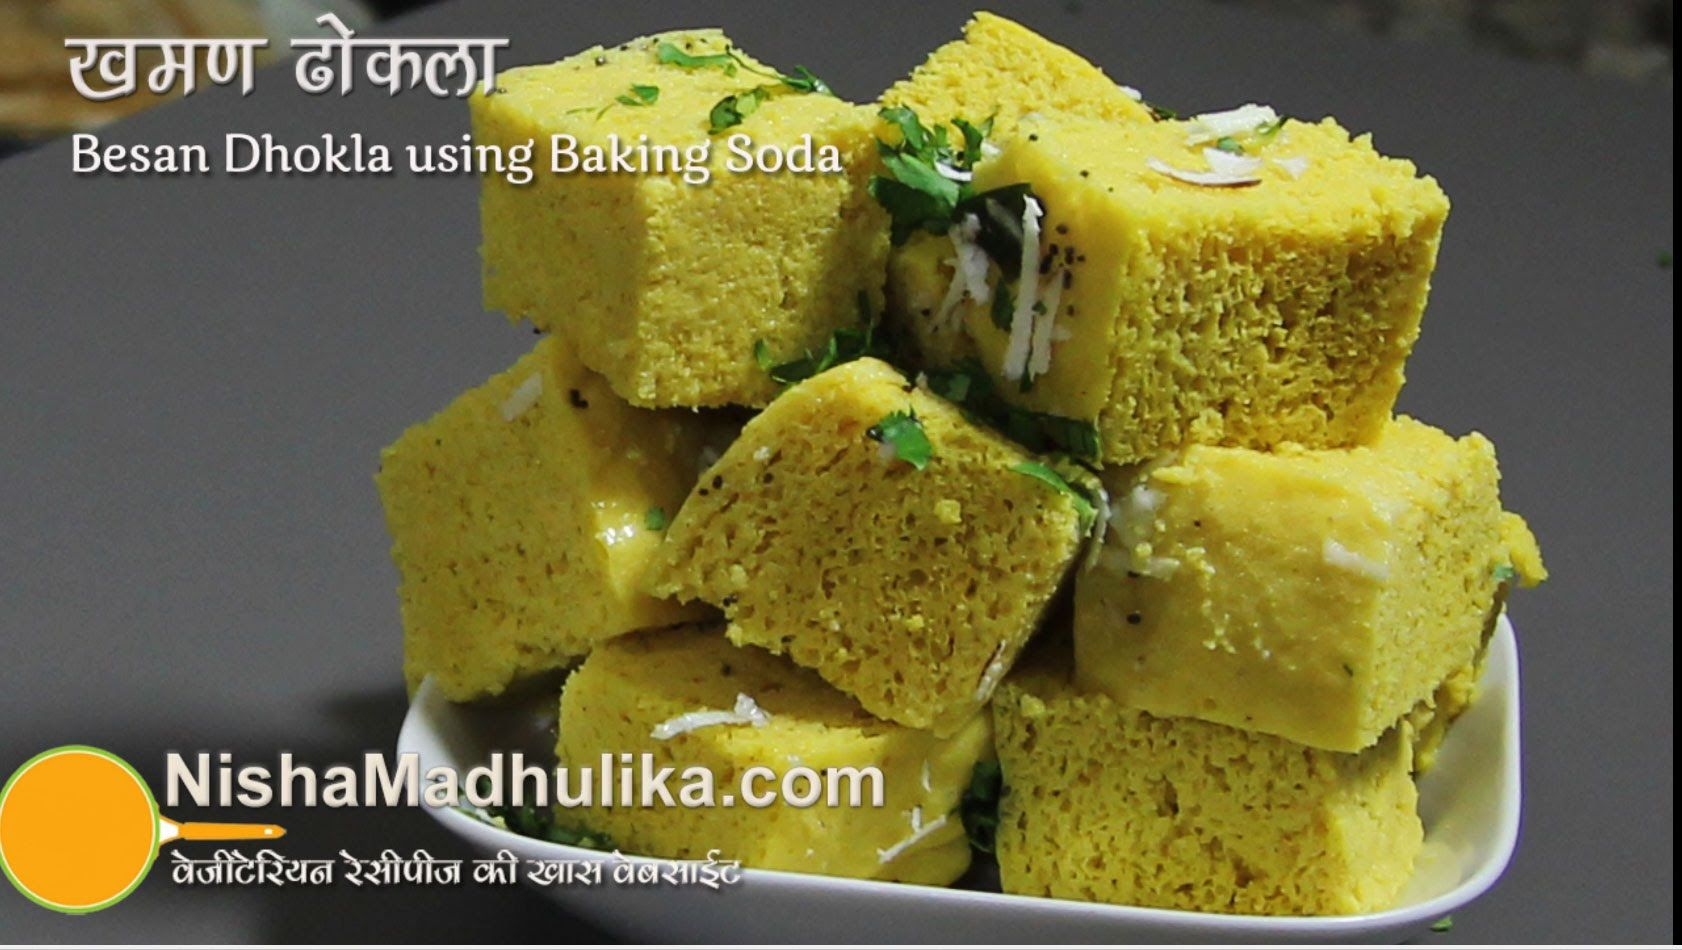 Besan dhokla recipe khaman dhokla recipe instant dhokla dhokla besan dhokla recipe khaman dhokla recipe instant dhokla dhokla withou forumfinder Choice Image